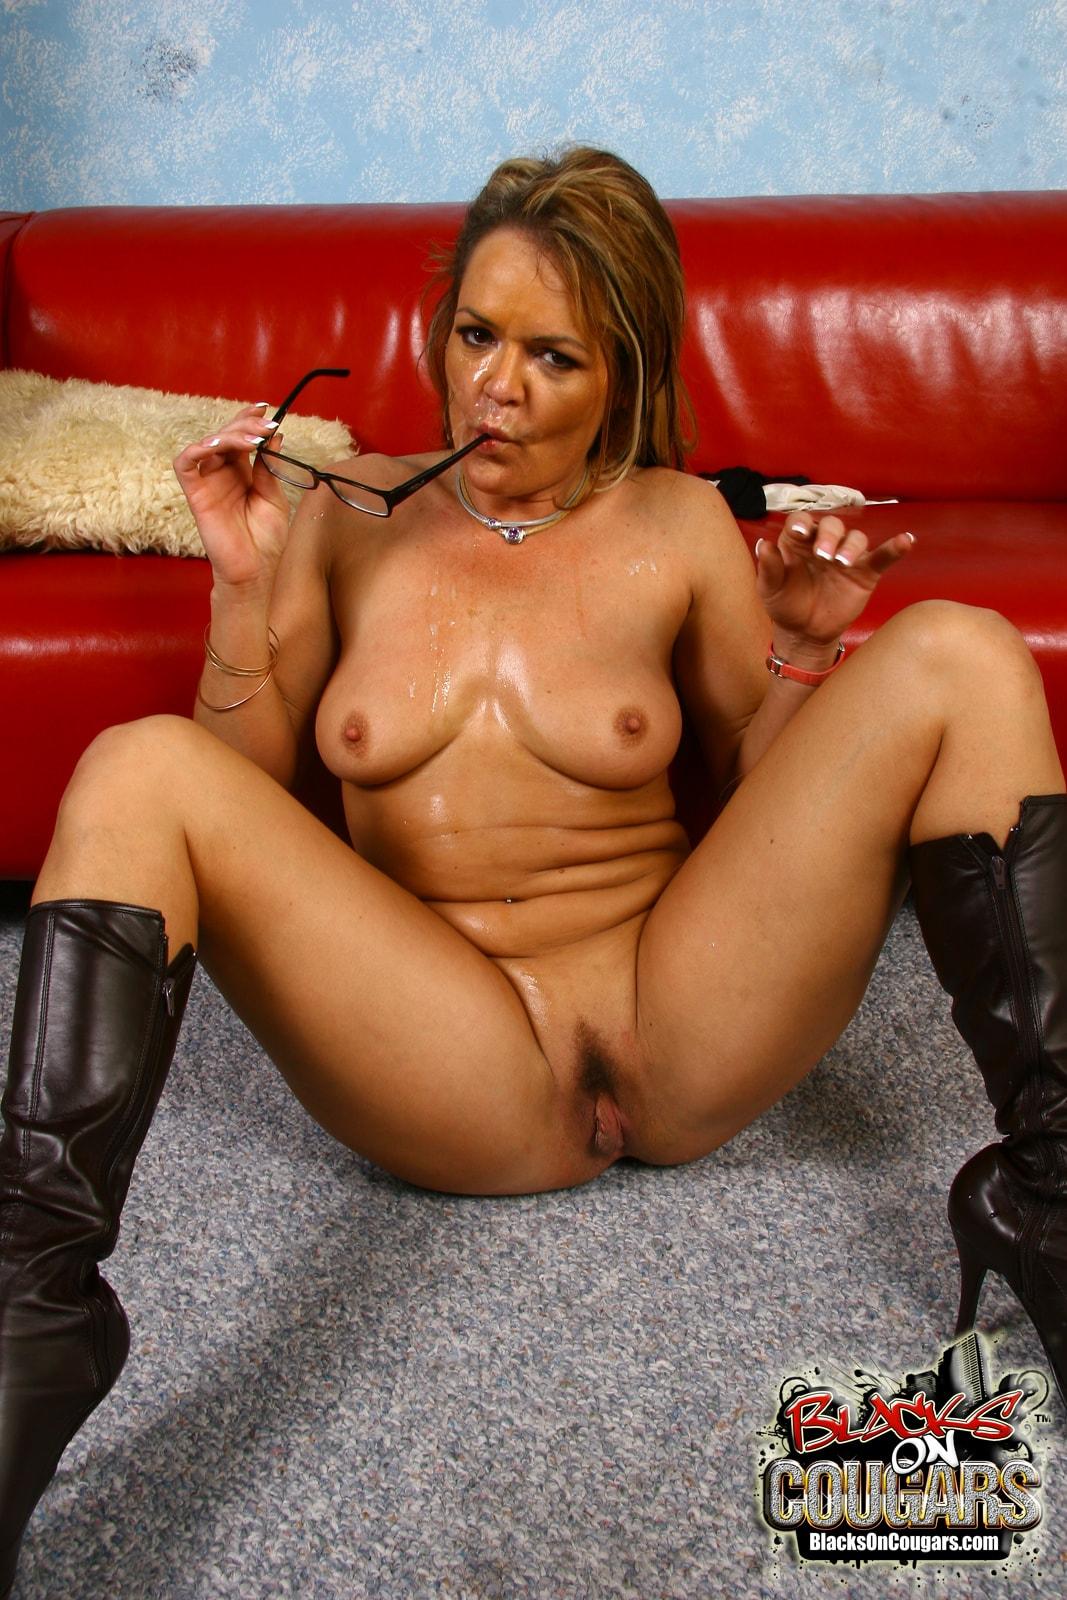 Dogfart '- Blacks On Cougars' starring Kelly Leigh (Photo 30)